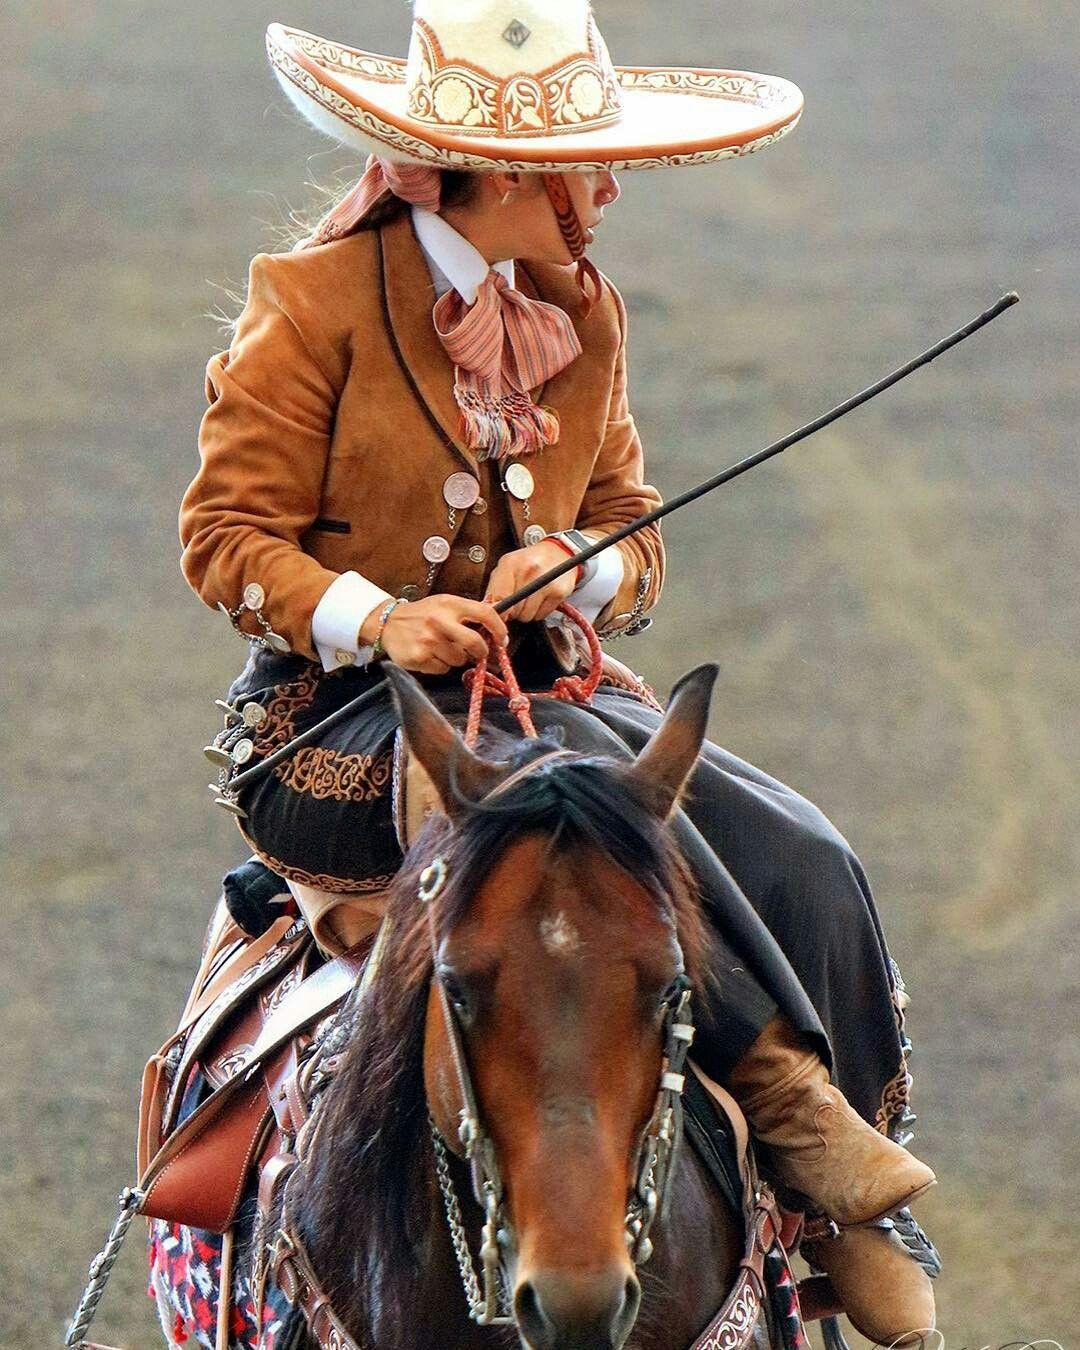 Escaramuza #Charrería. #México 🇲🇽 | HORSES IS MY LIFE en ...